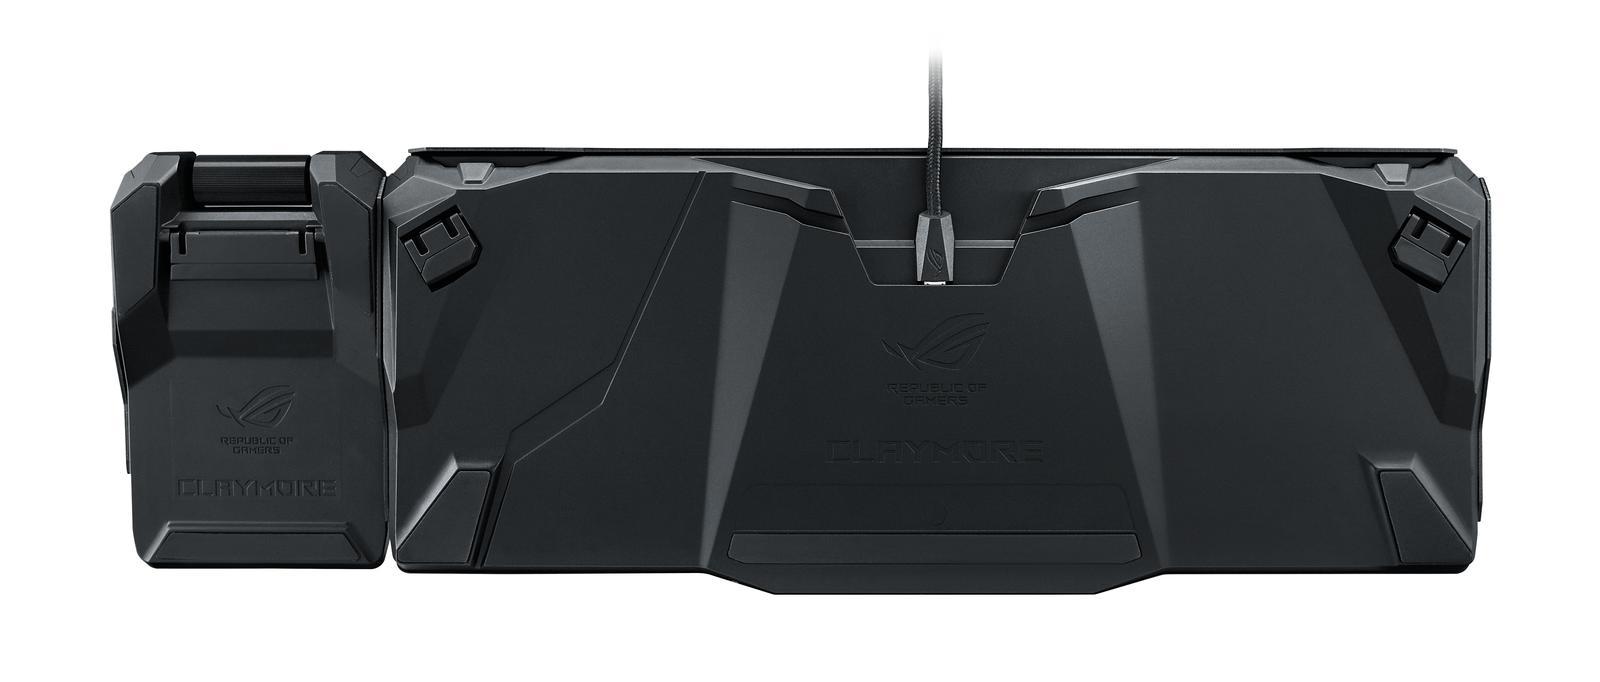 Asus ROG Claymore RGB Wired Gaming Keyboard